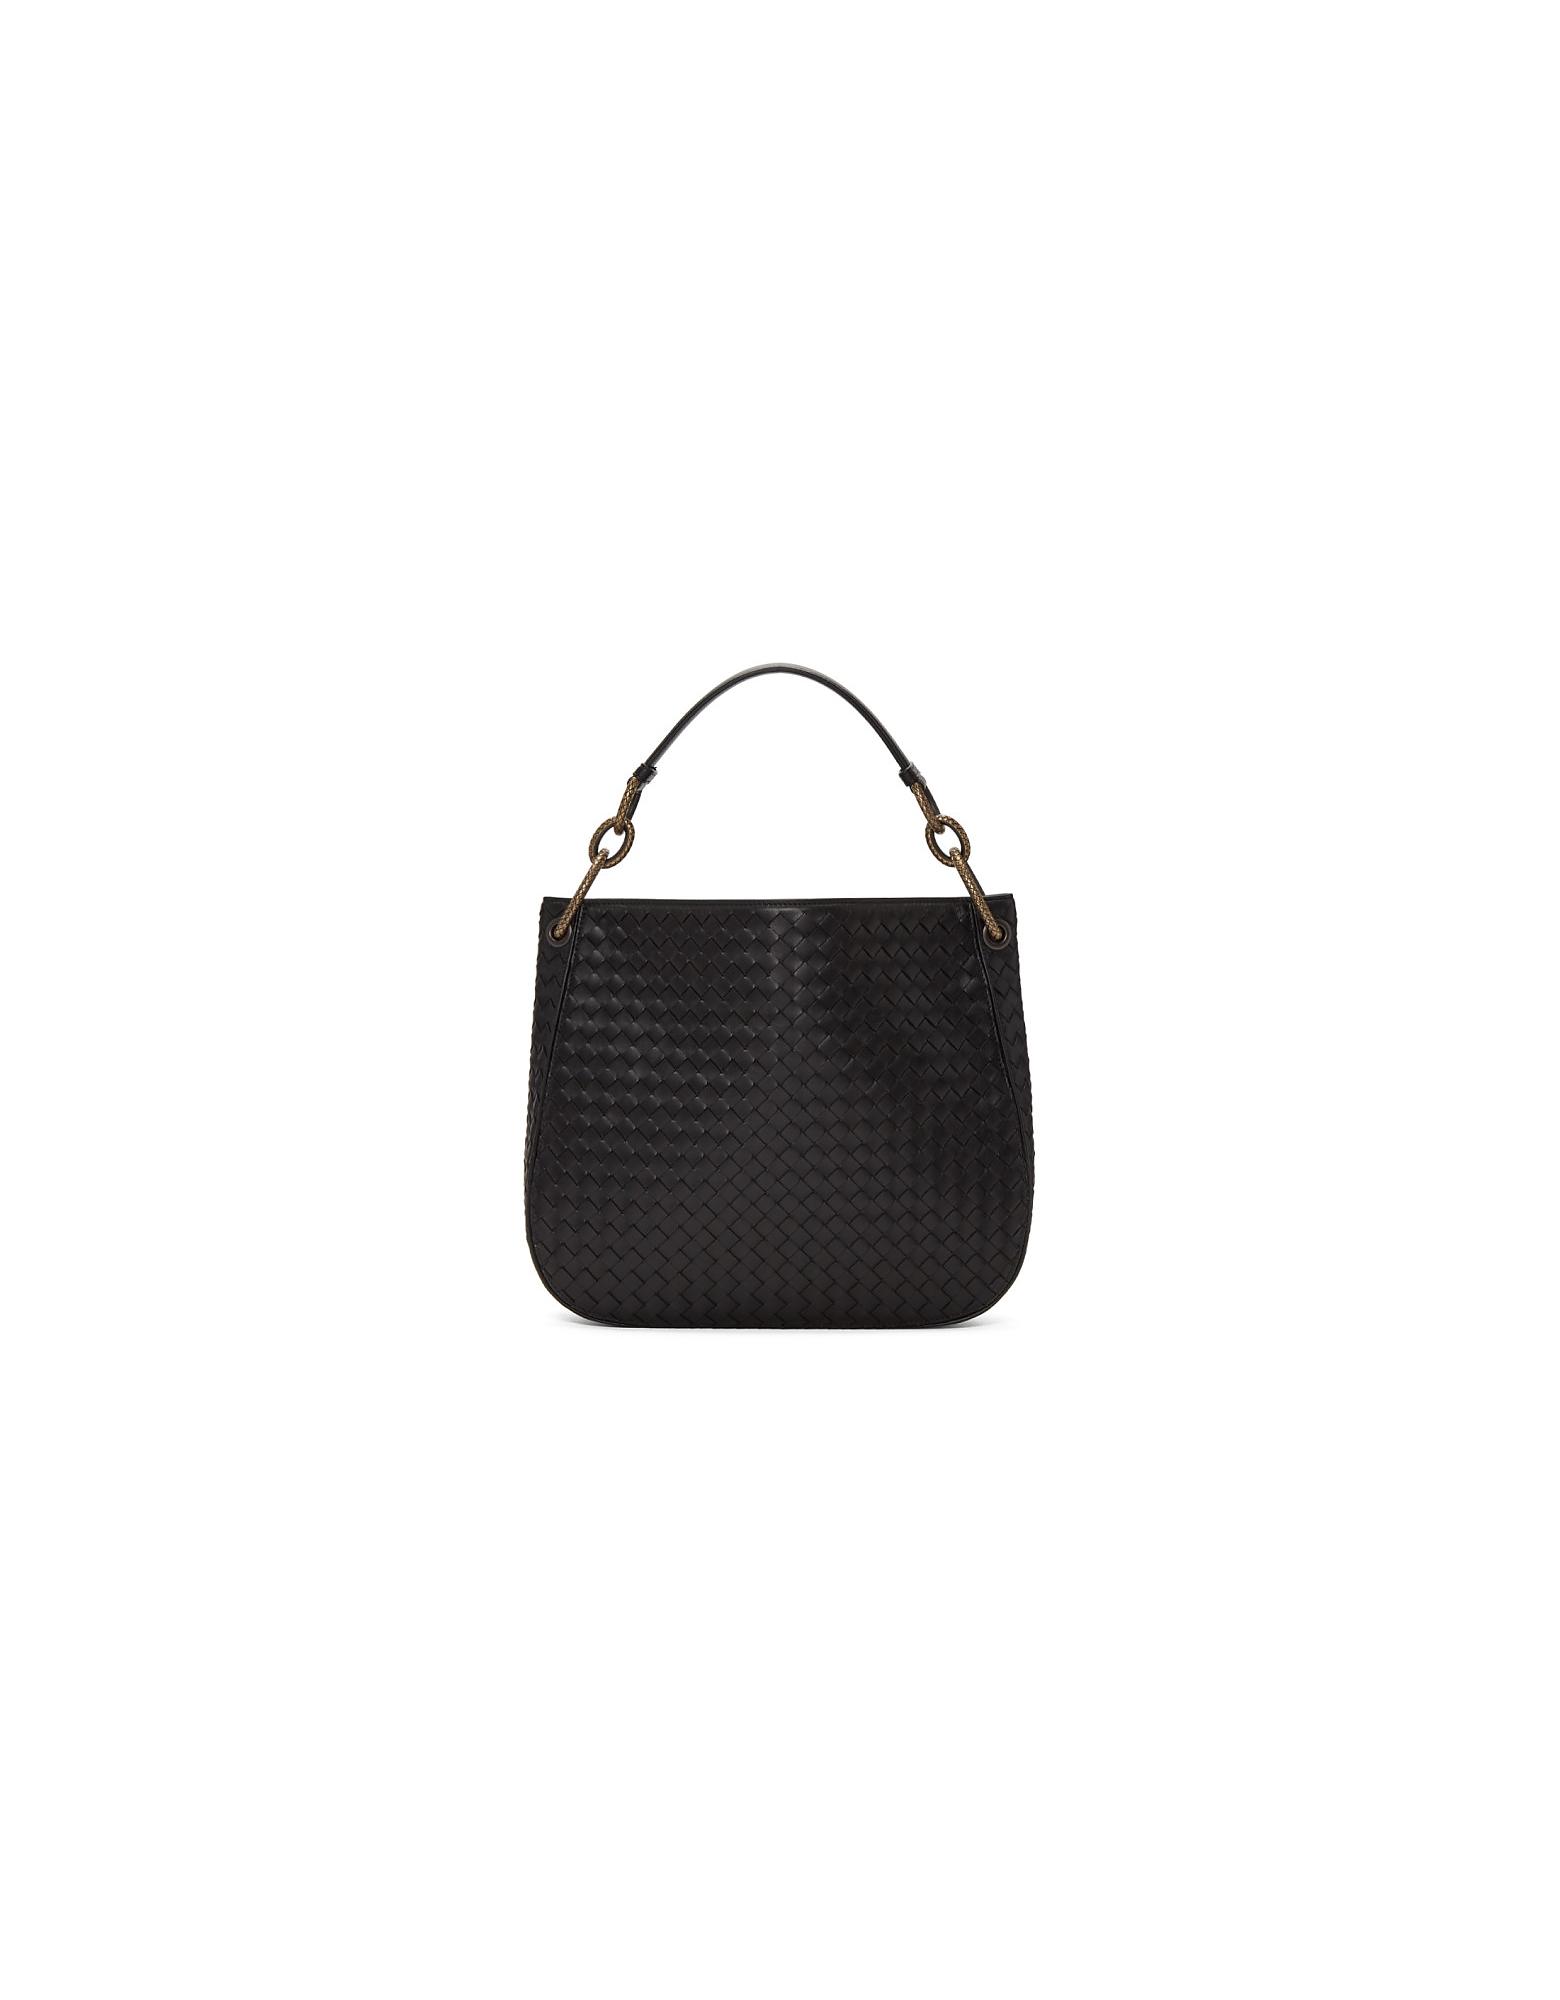 Bottega Veneta Designer Handbags, Black Intrecciato Loop Bag